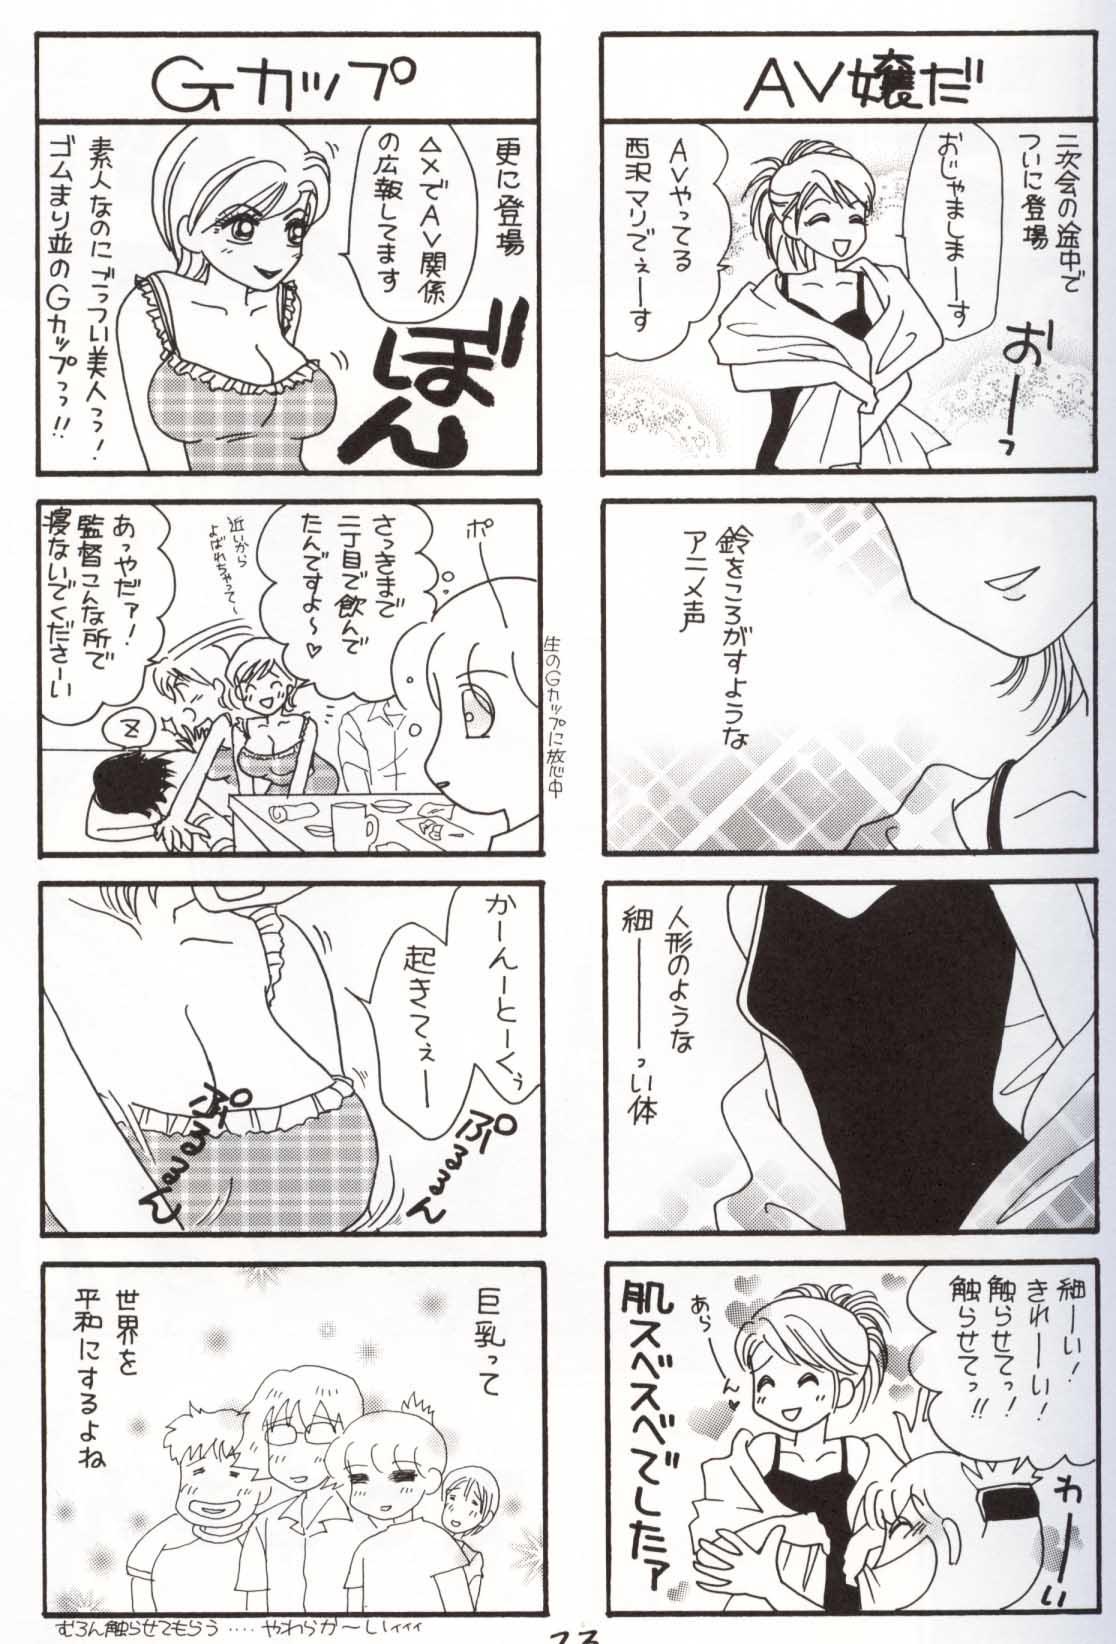 GIRL POWER Vol.10 21